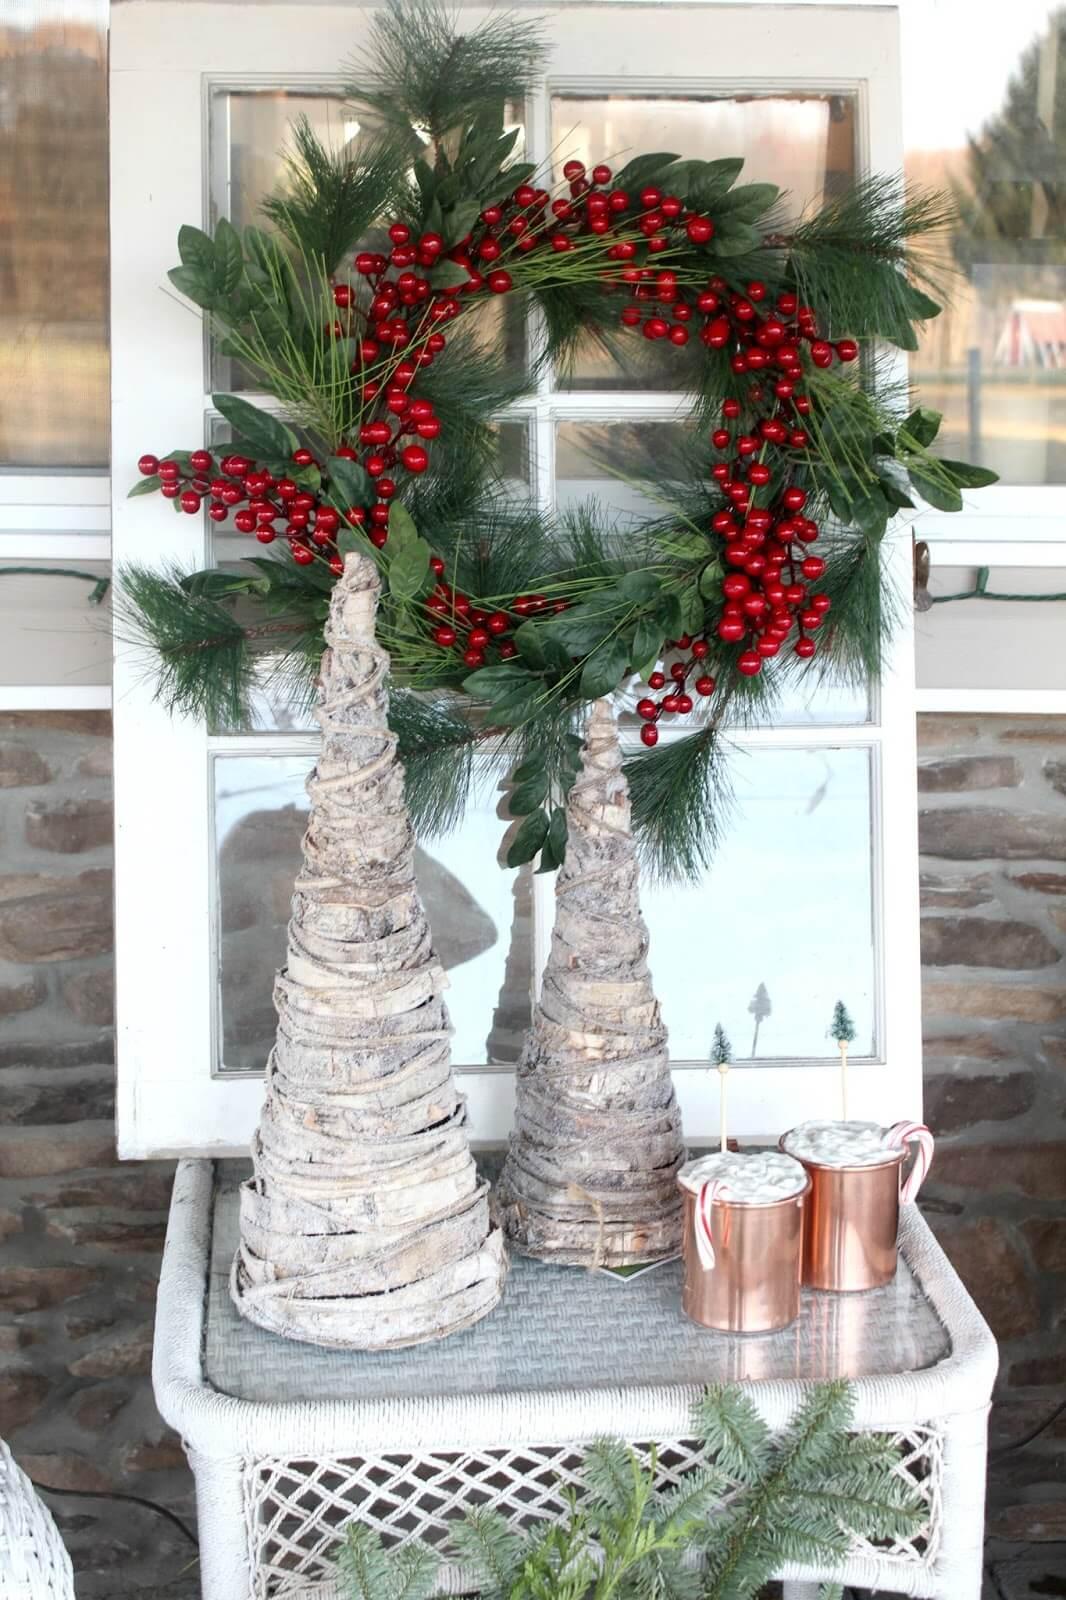 38 Best Rustic Farmhouse Christmas Decor Ideas and Designs